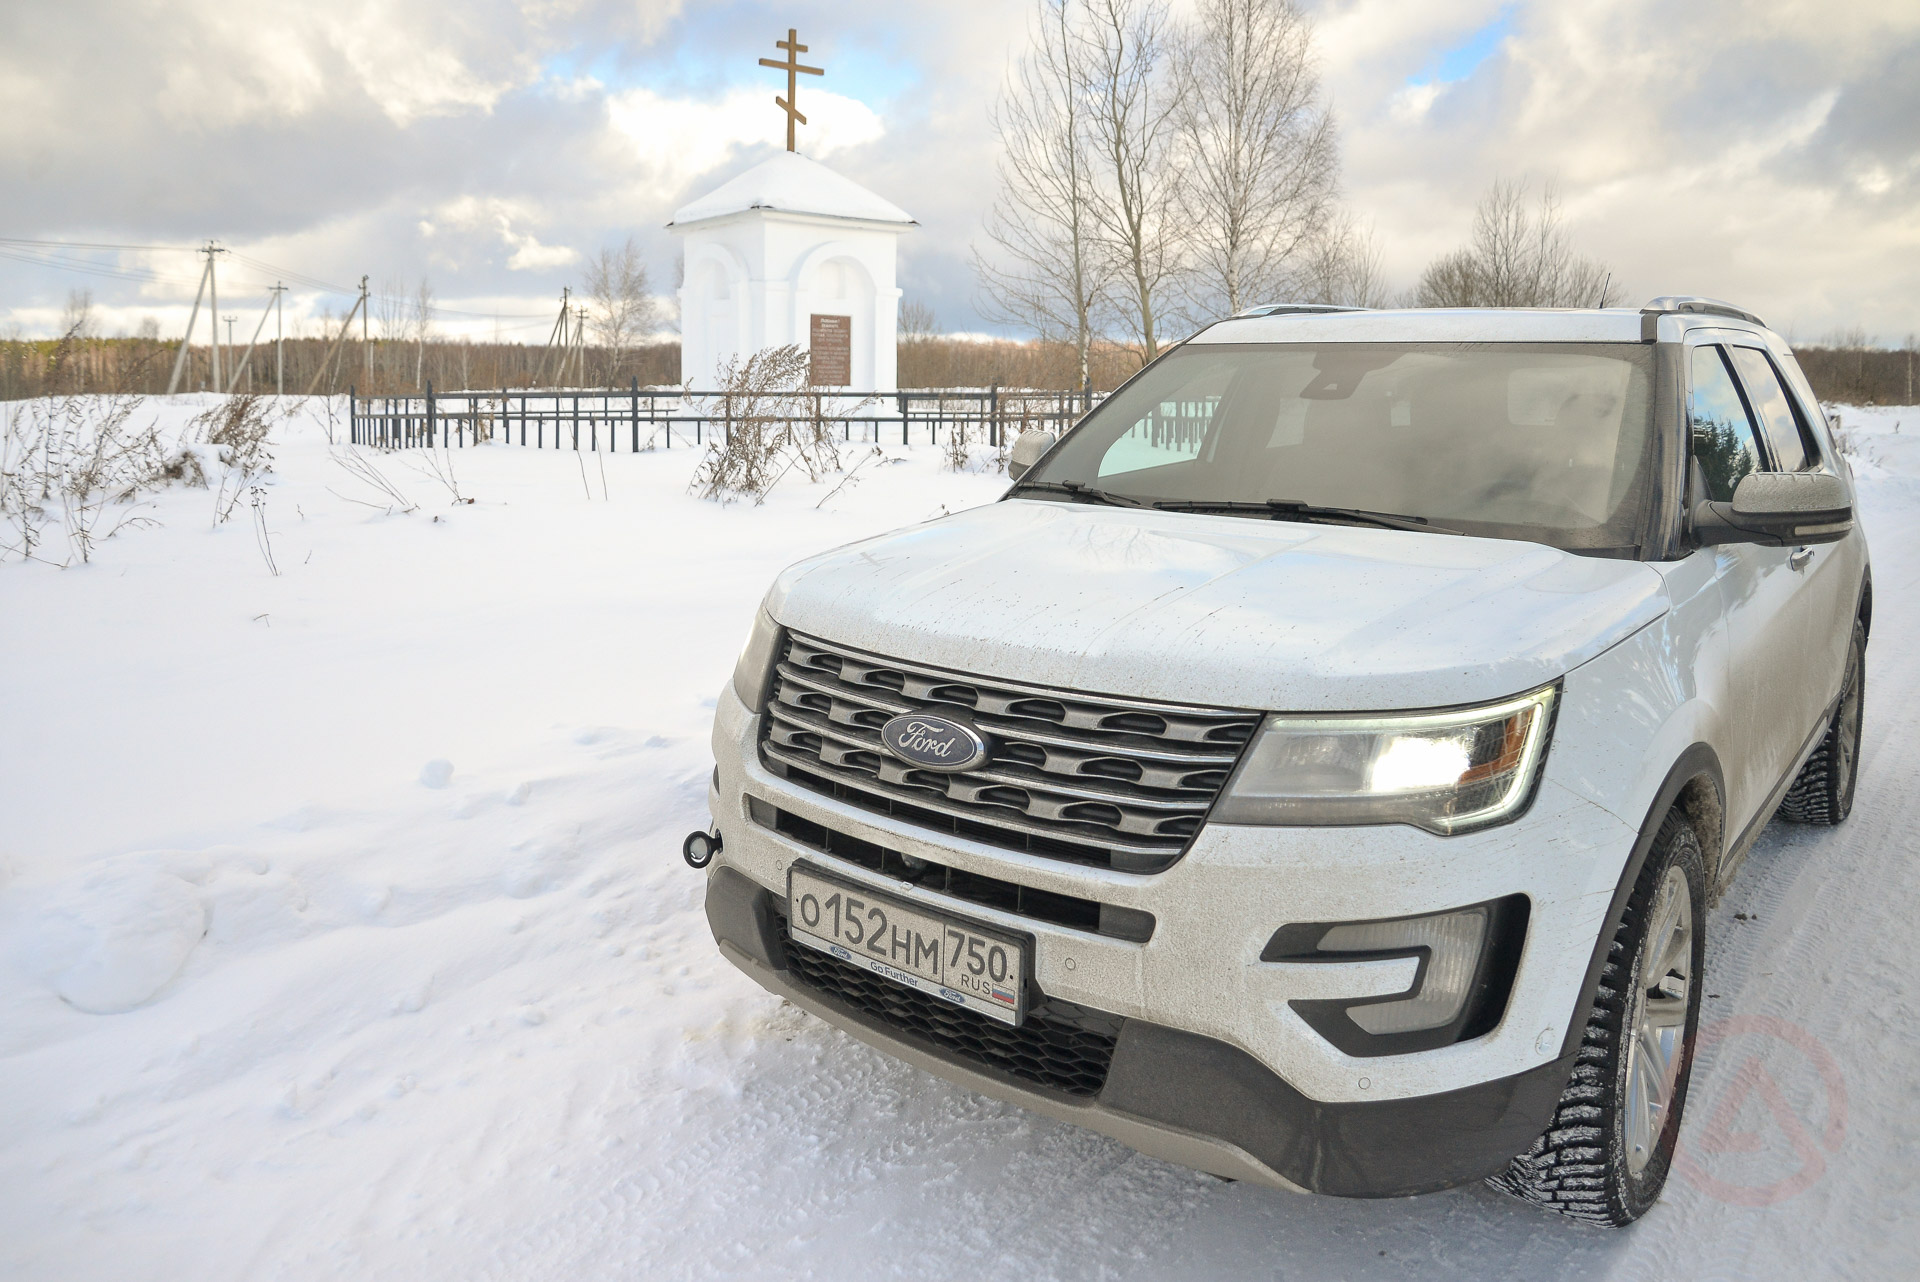 Ford Explorer 2016. Фото Сергей Асланян